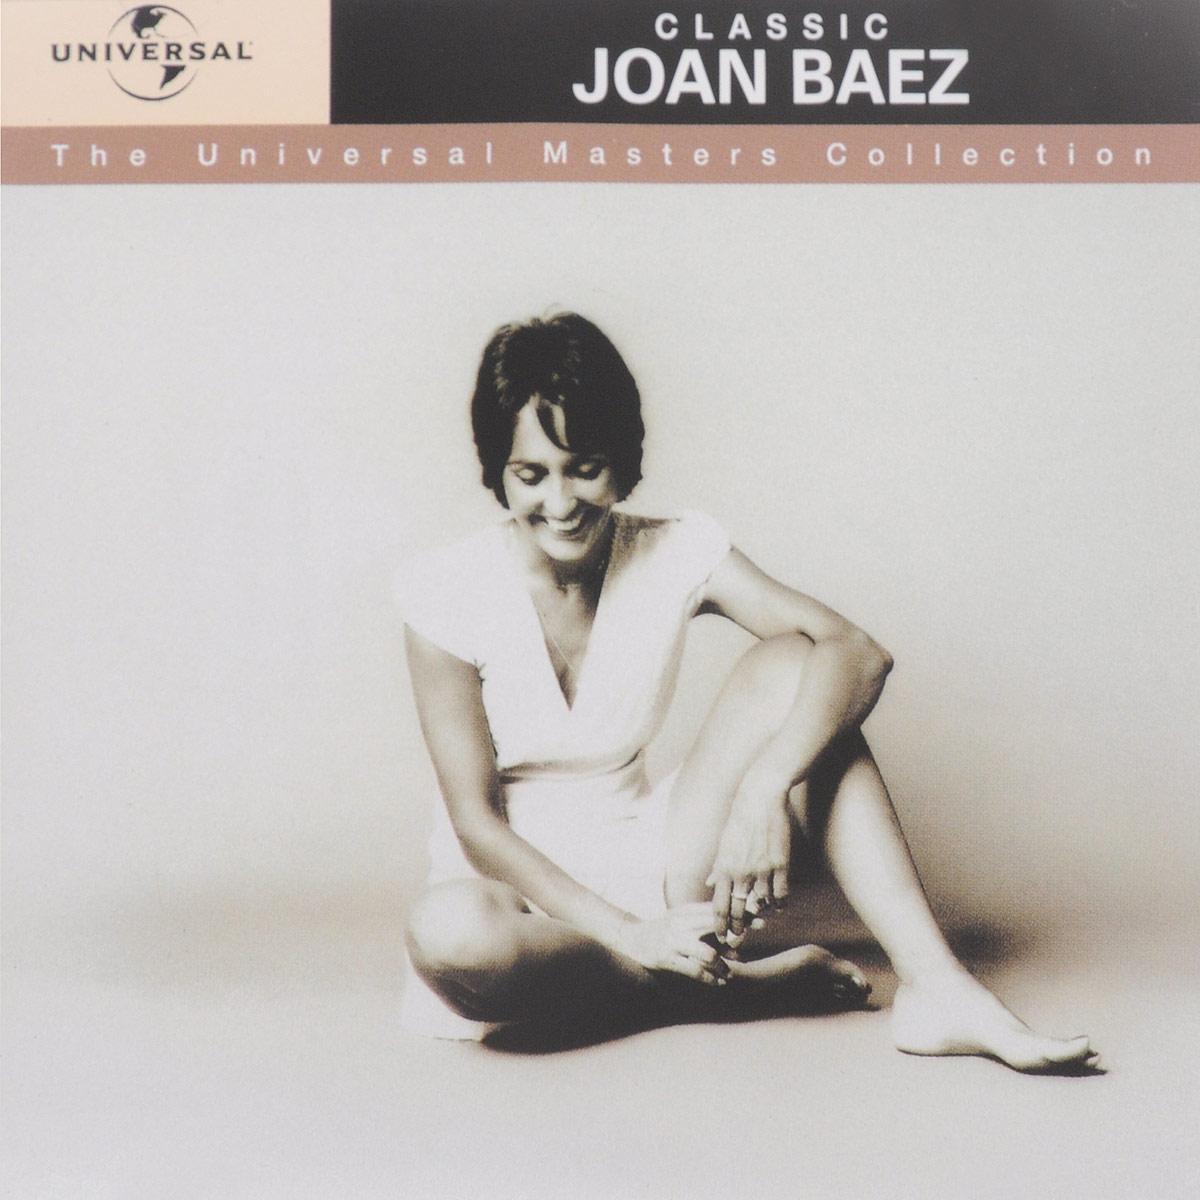 Joan Baez. Joan Baez - Universal Masters baseball jersey 52 baez pedro baez jersey